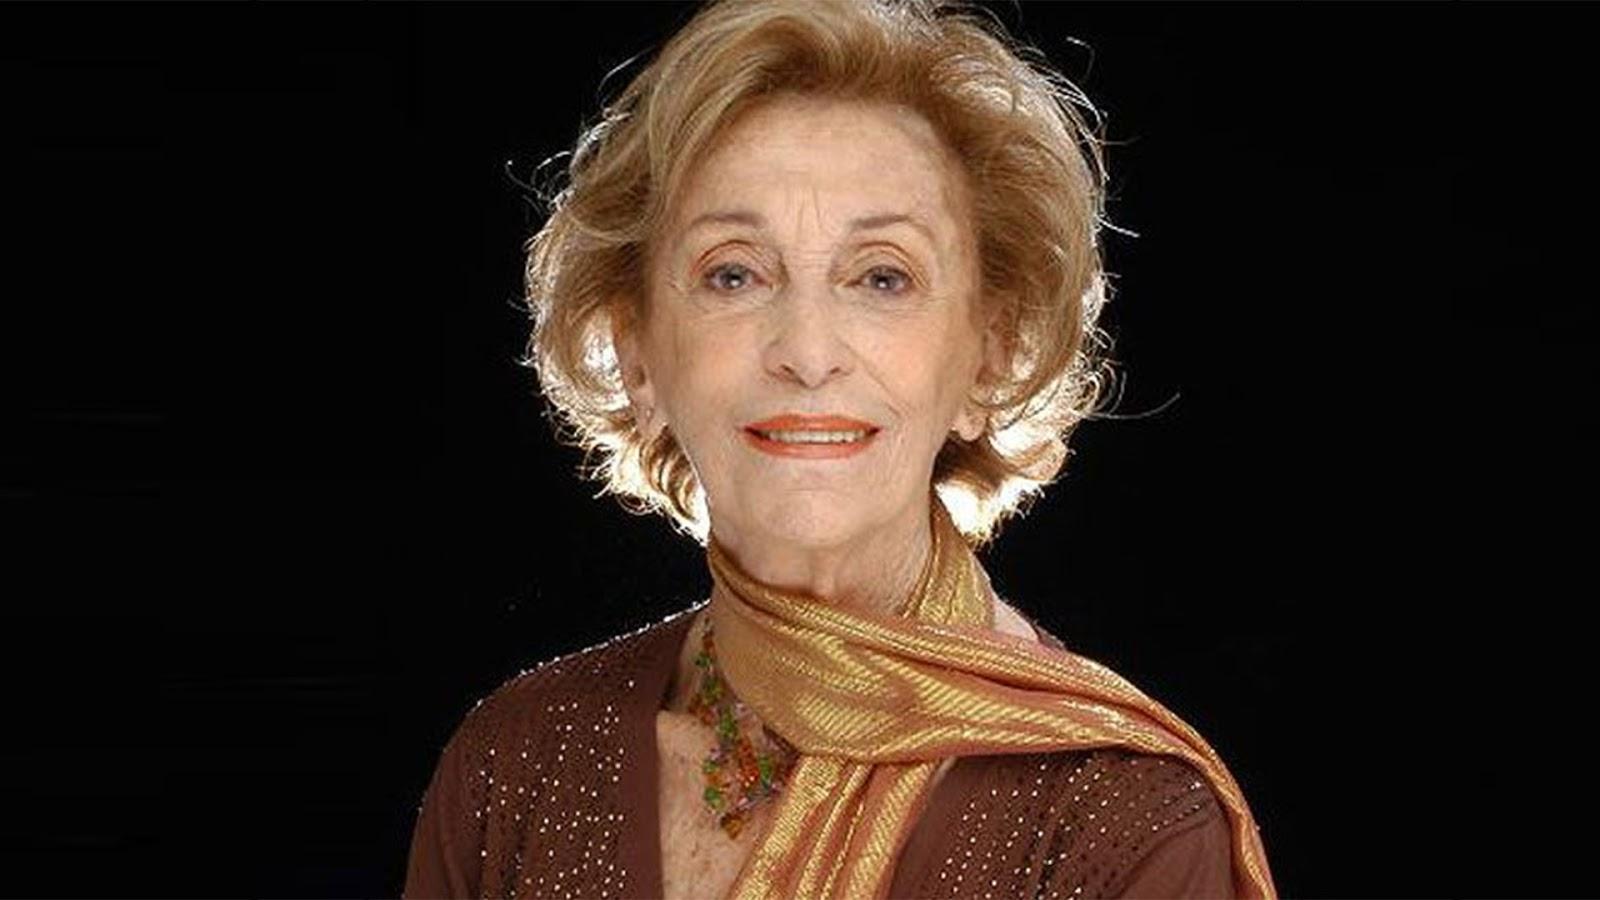 Hilda Bernard hoy coronavirus